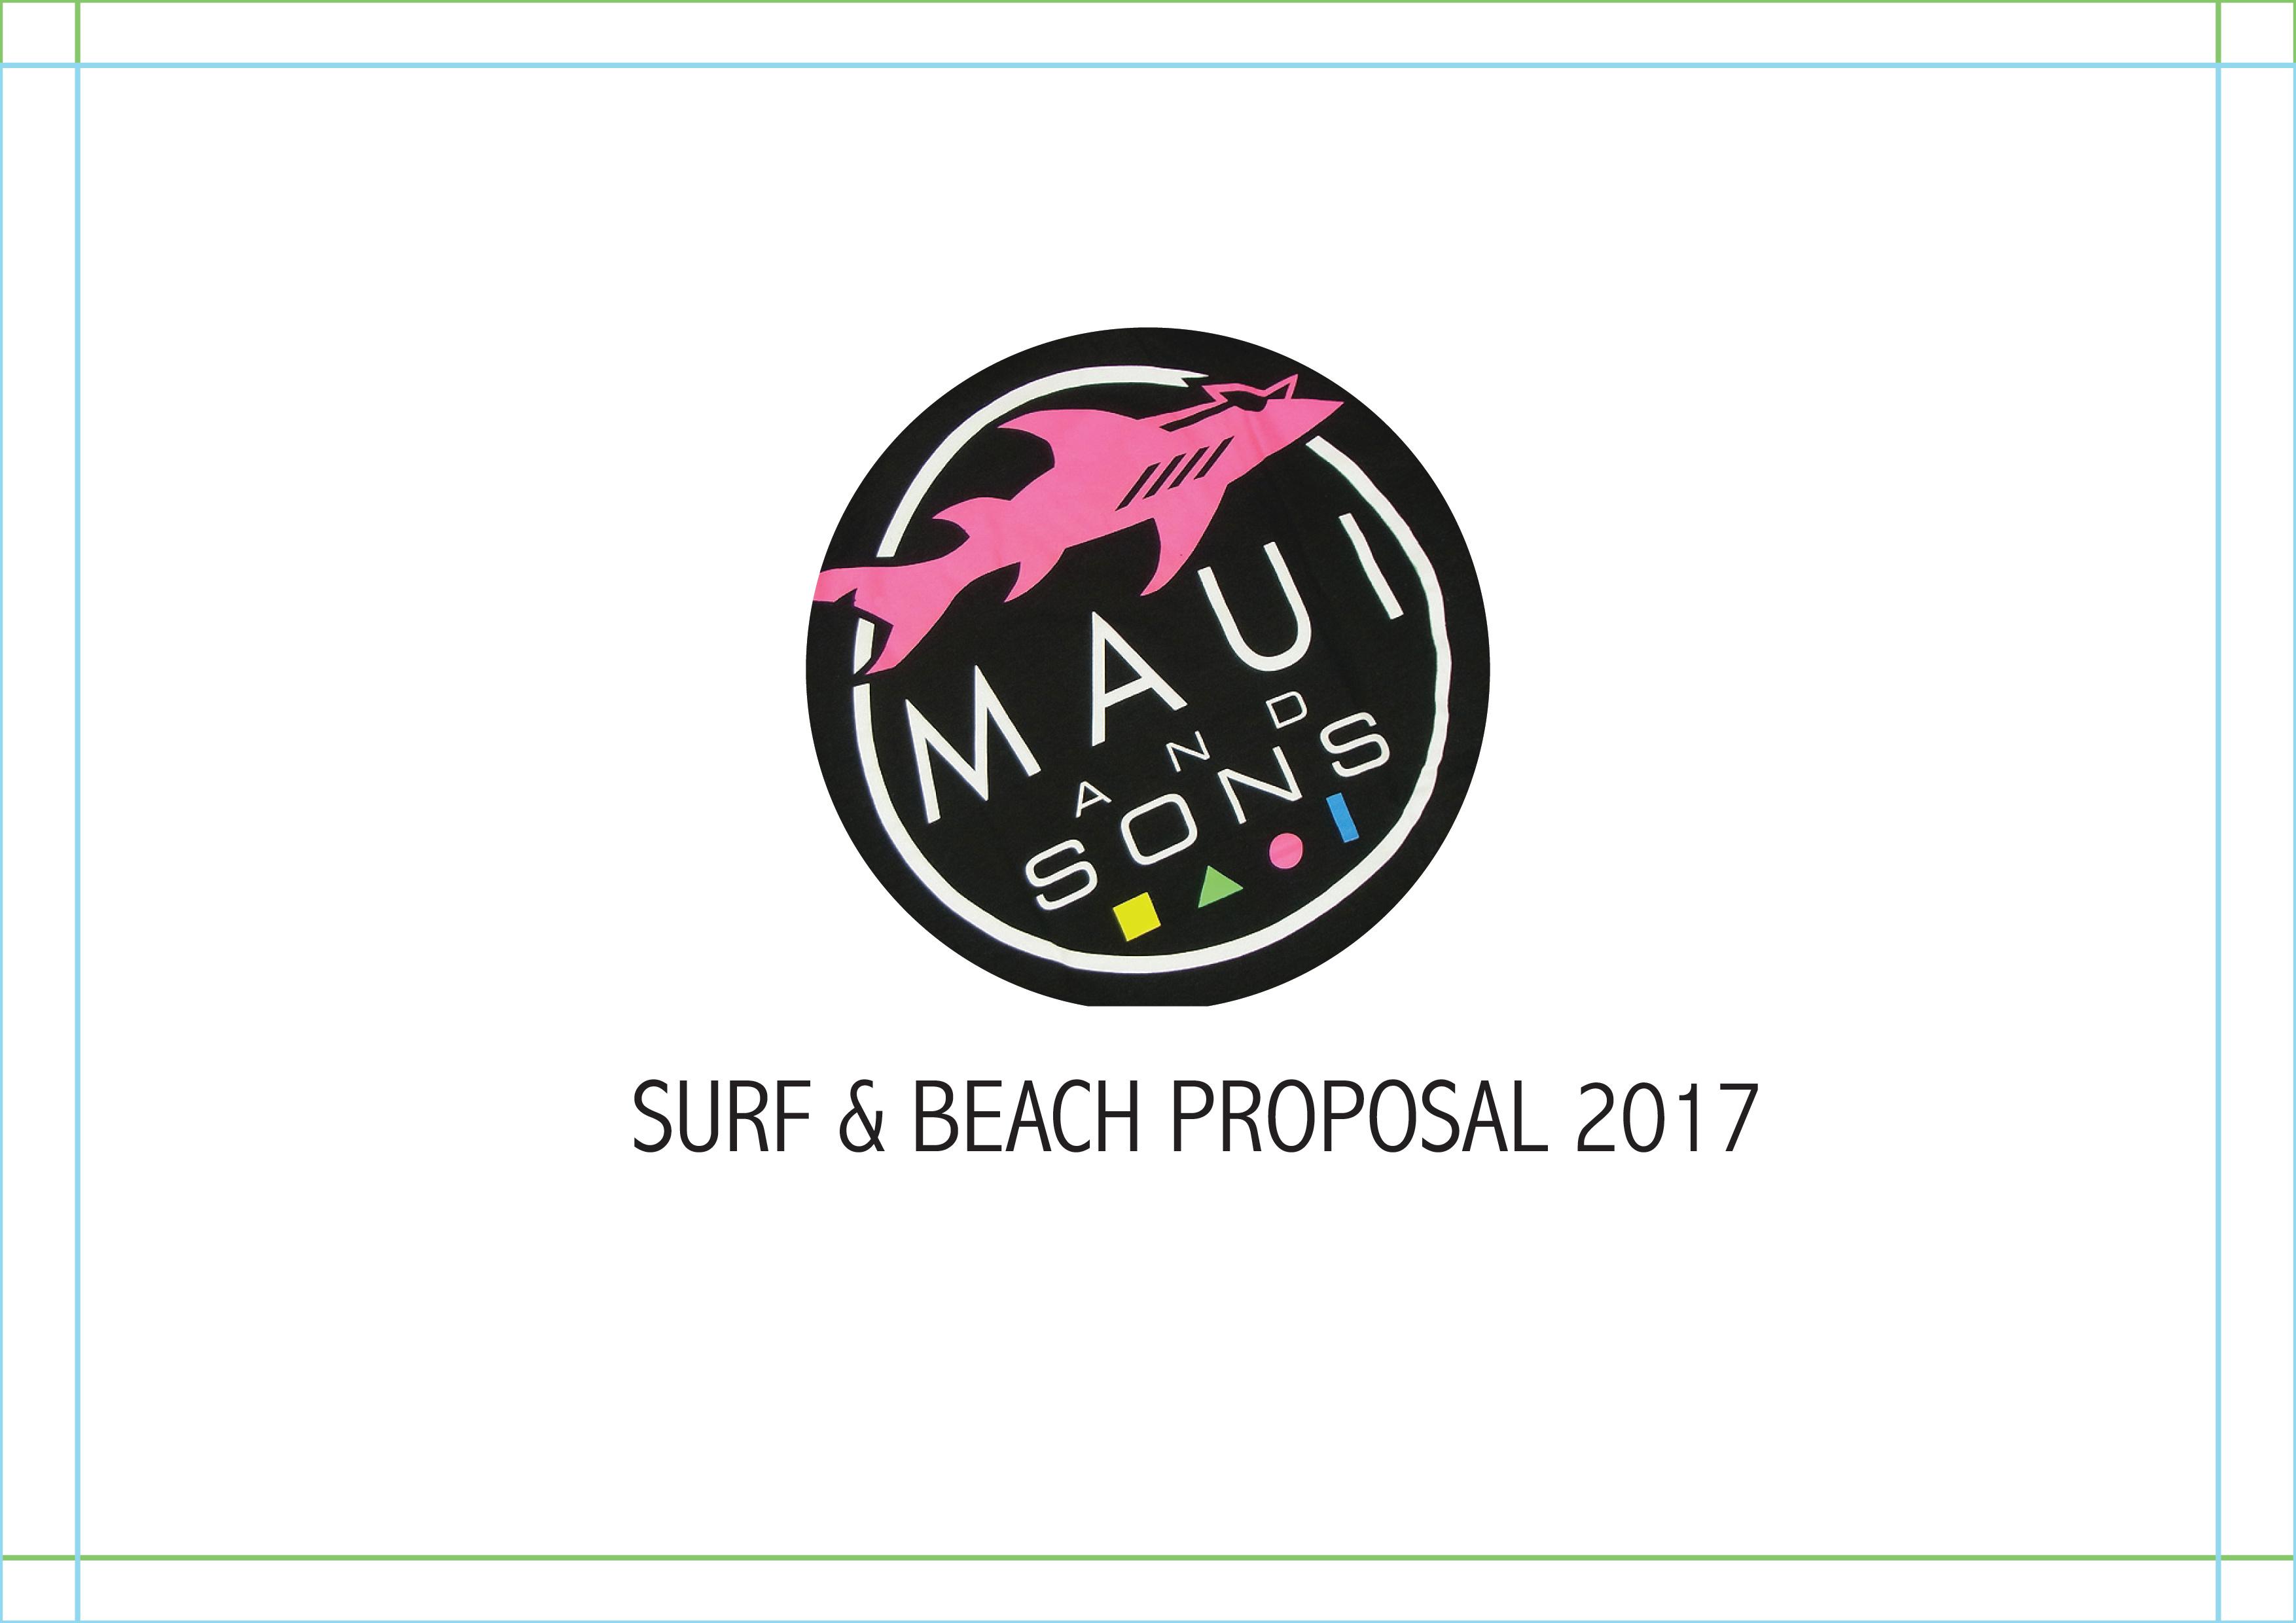 Surf & Beach Proposal 2016